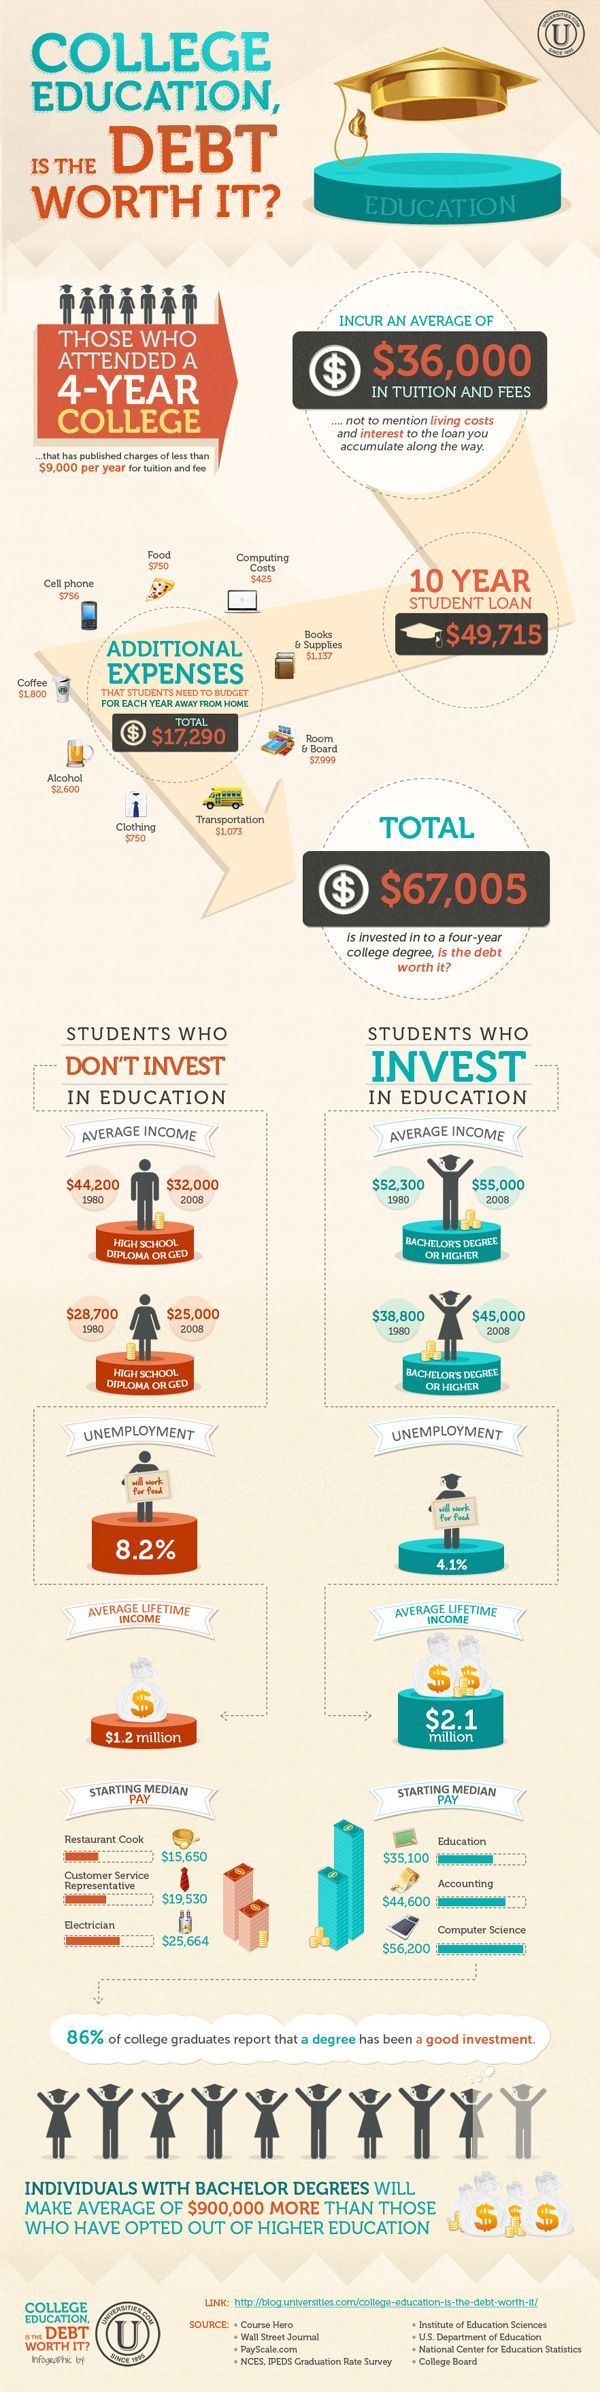 Mejores 2132 imágenes de College Education en Pinterest   Consejos ...